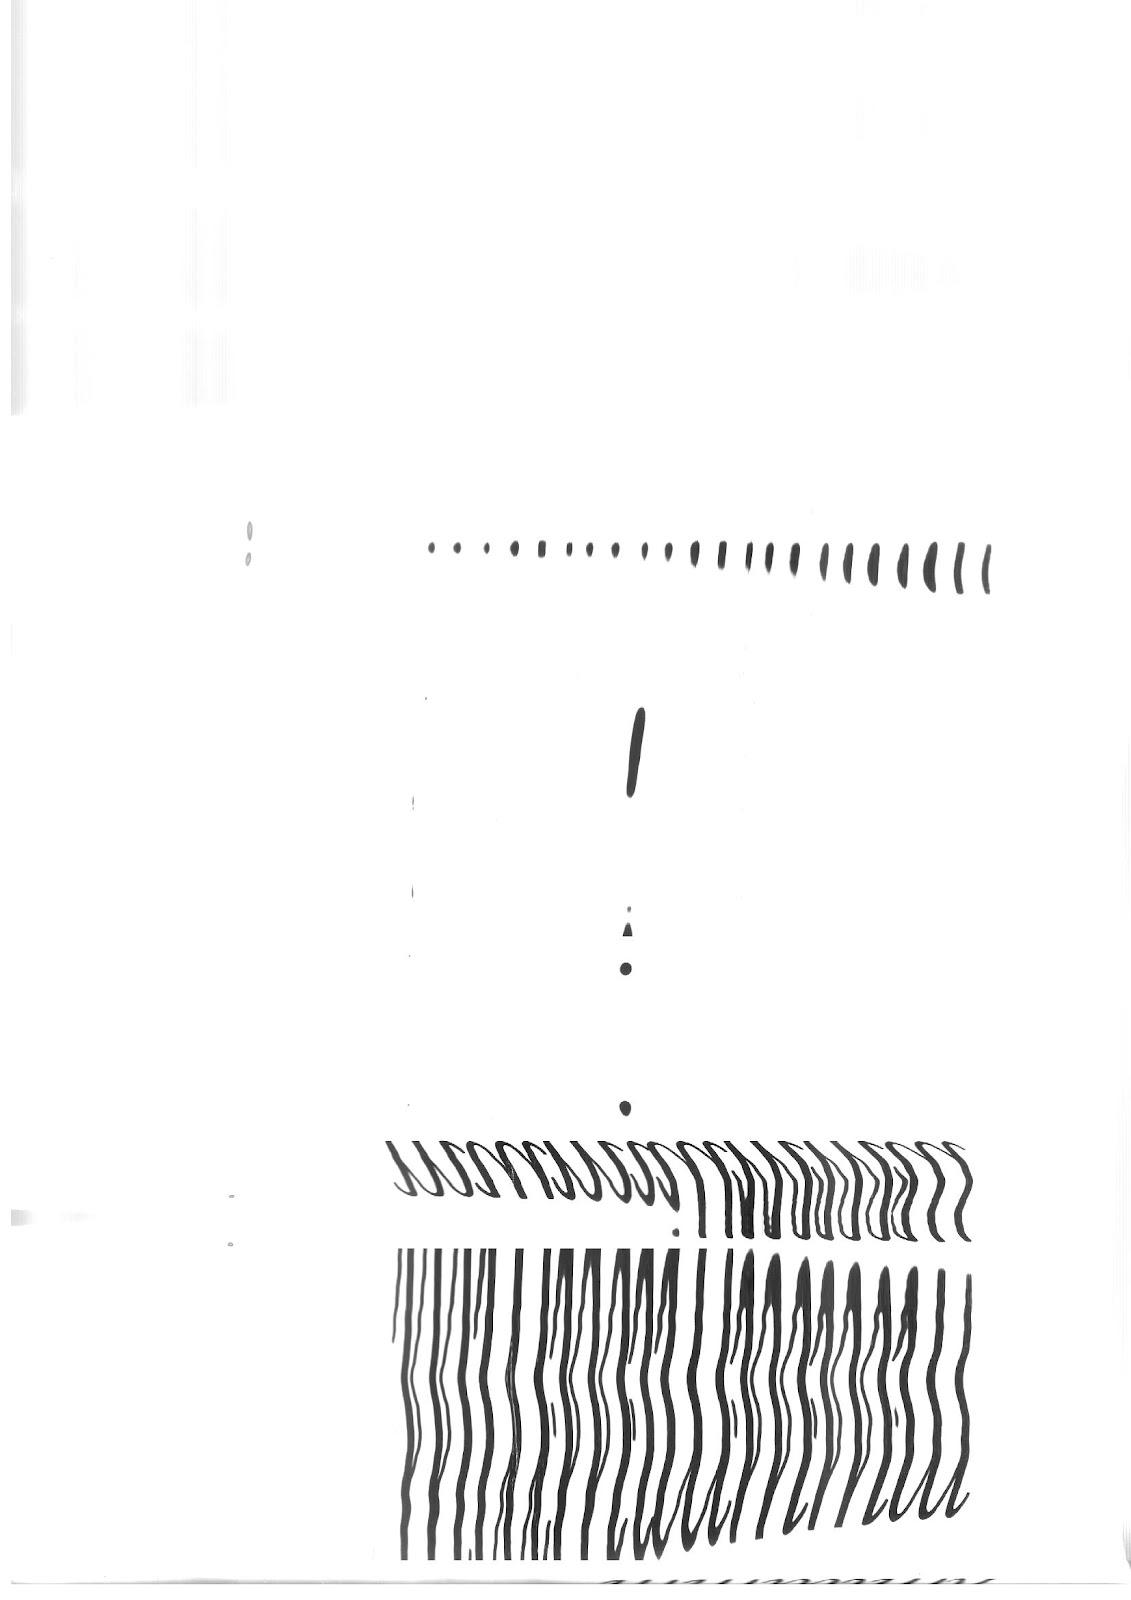 Cormac McCarthy's Dead Typewriter: Asemic Writing by